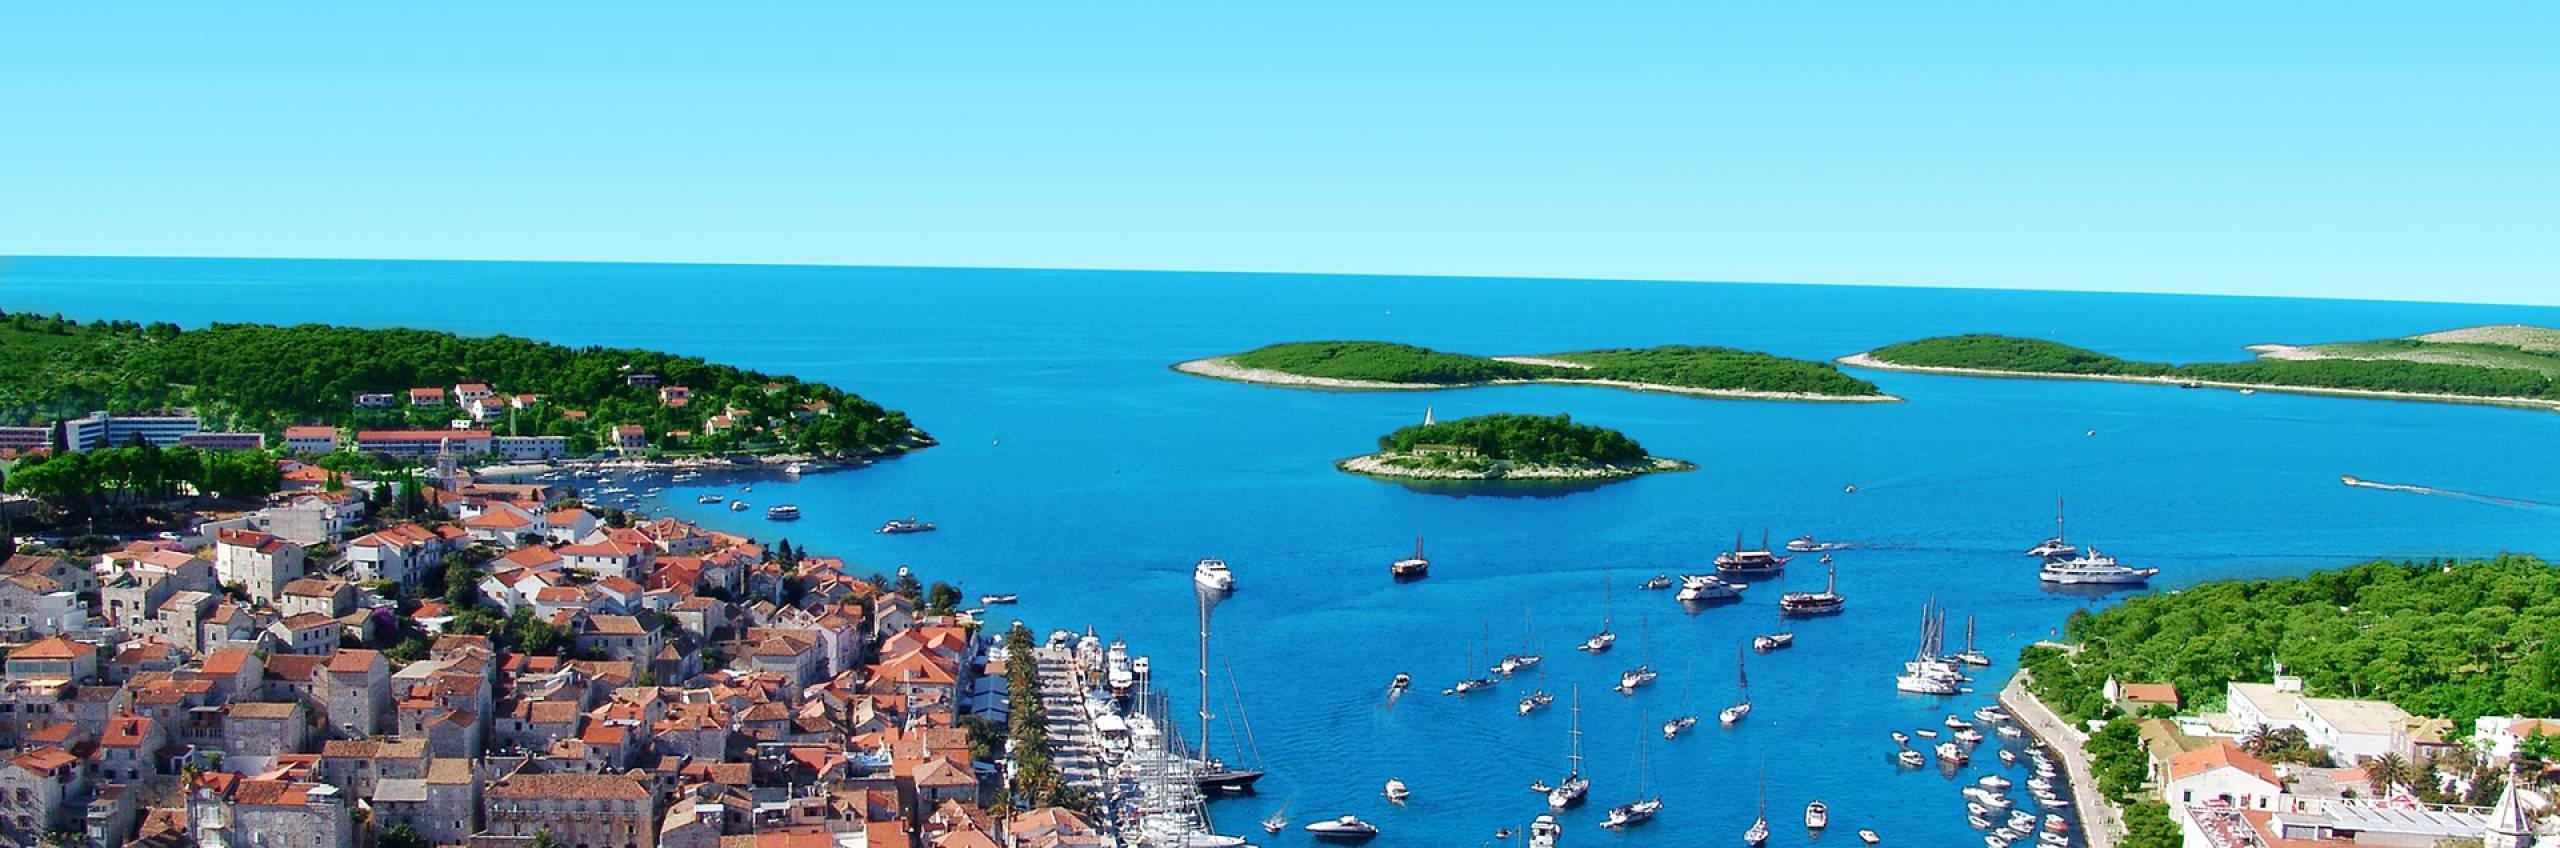 Croatia: 1185 islands and islets